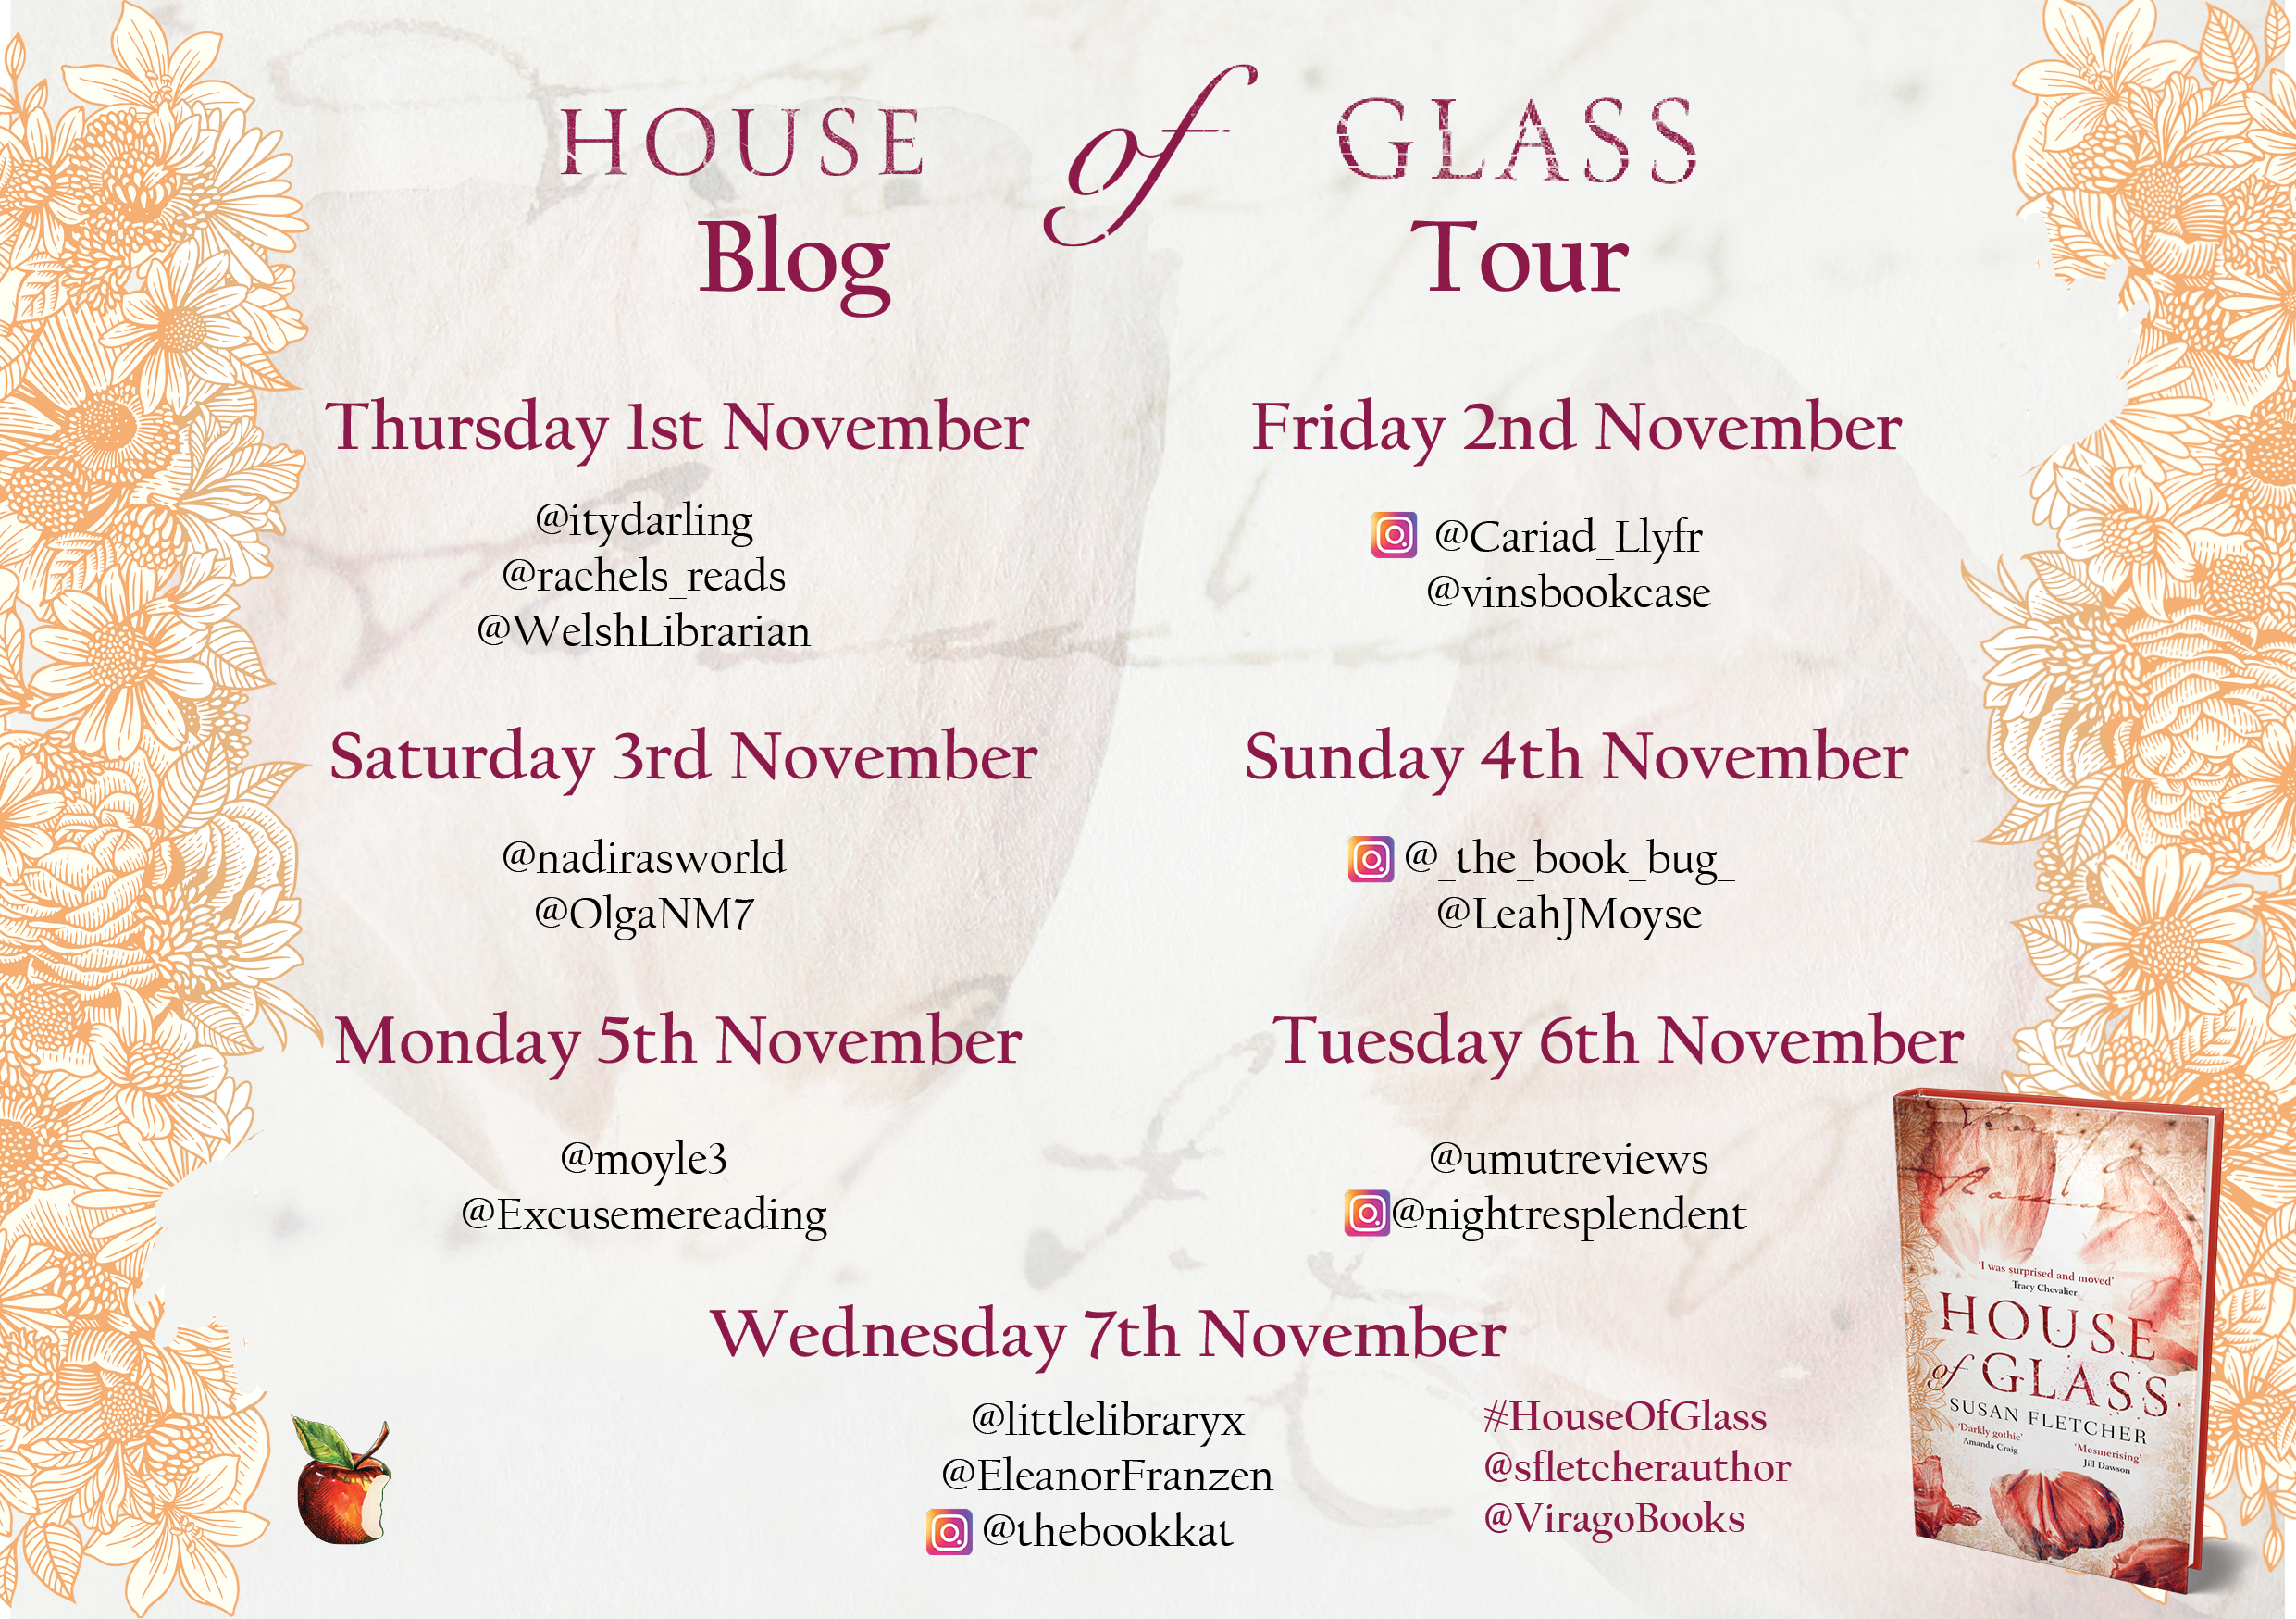 House of Glass Blog Tour